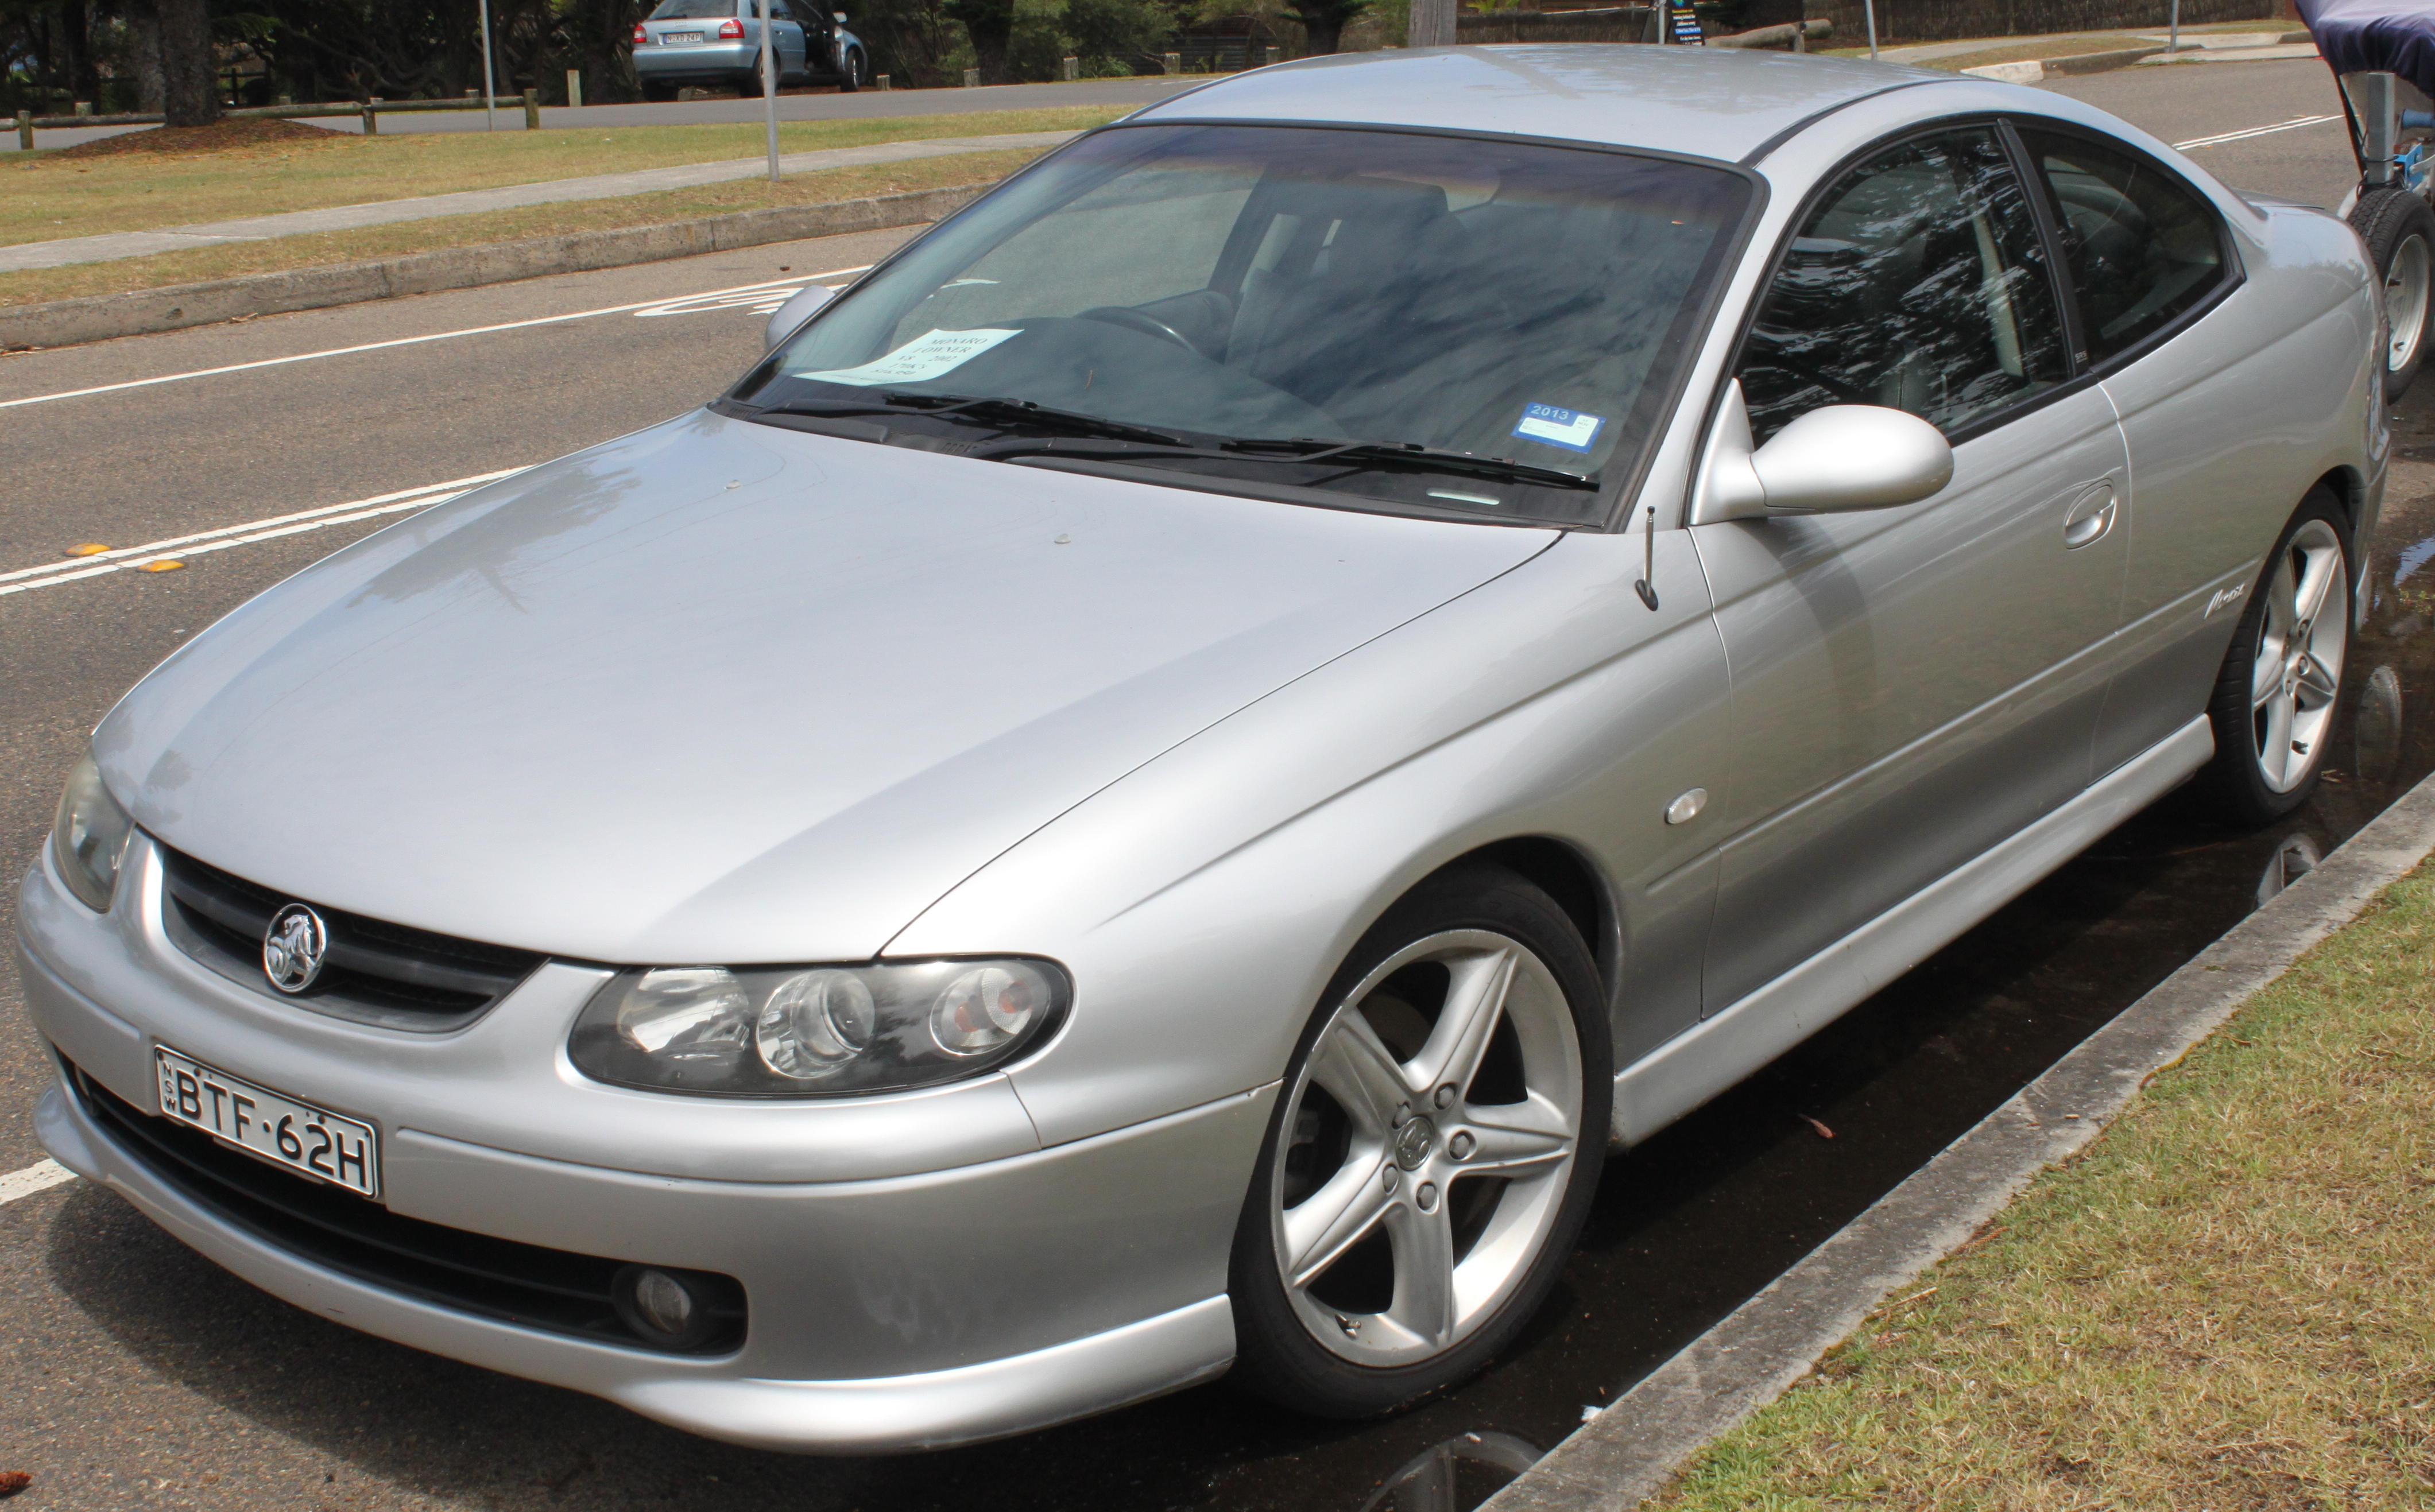 File:2002 Holden Monaro (V2) CV8 coupe (23998883351).jpg - Wikimedia